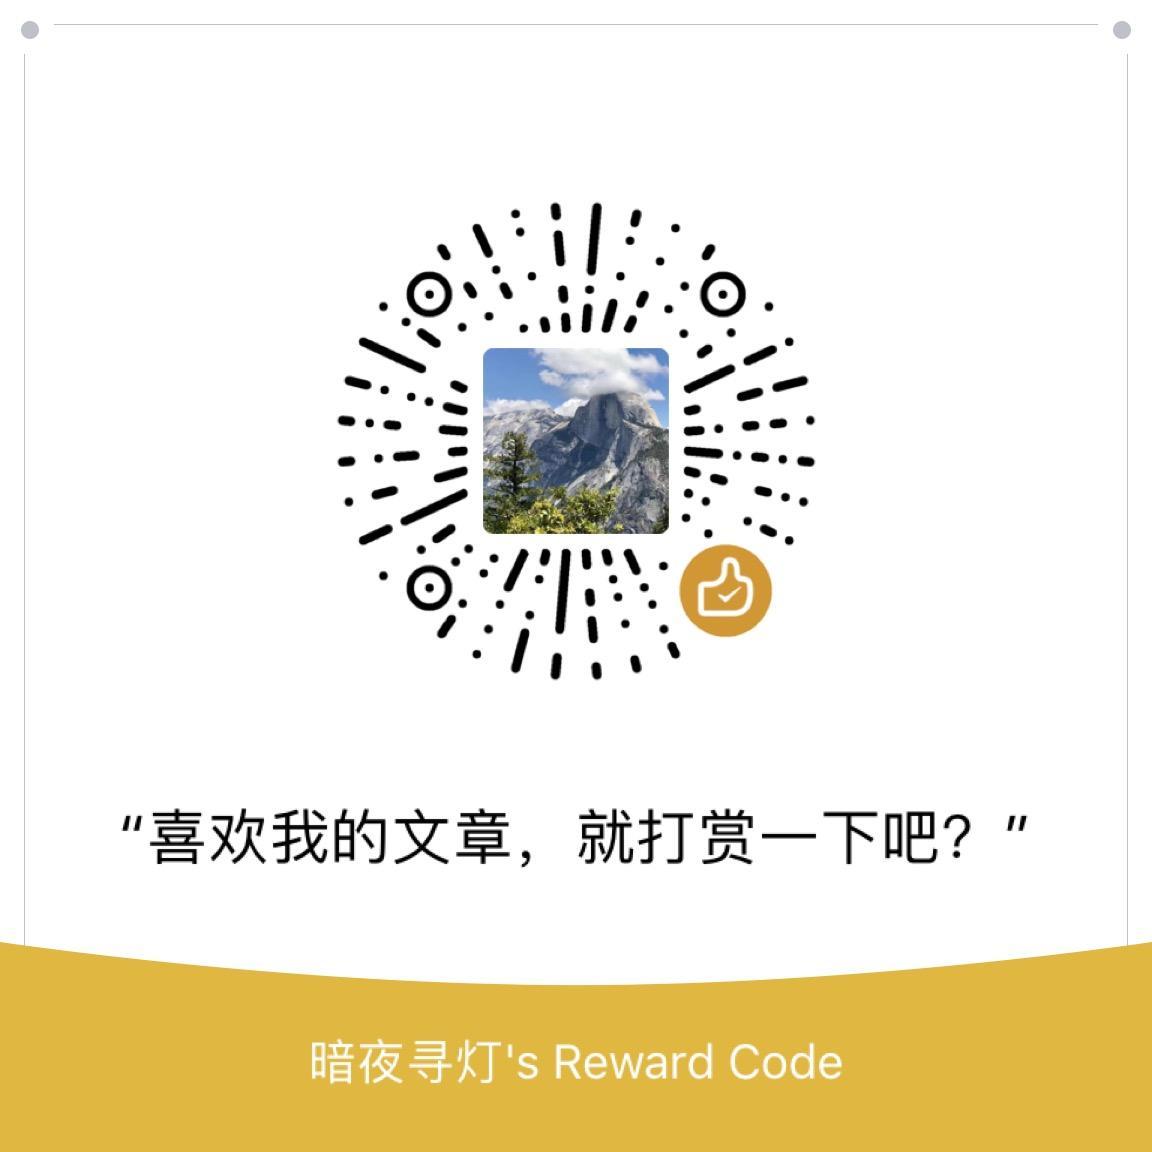 C:\Users\Winston WU\Desktop\reward.jpg